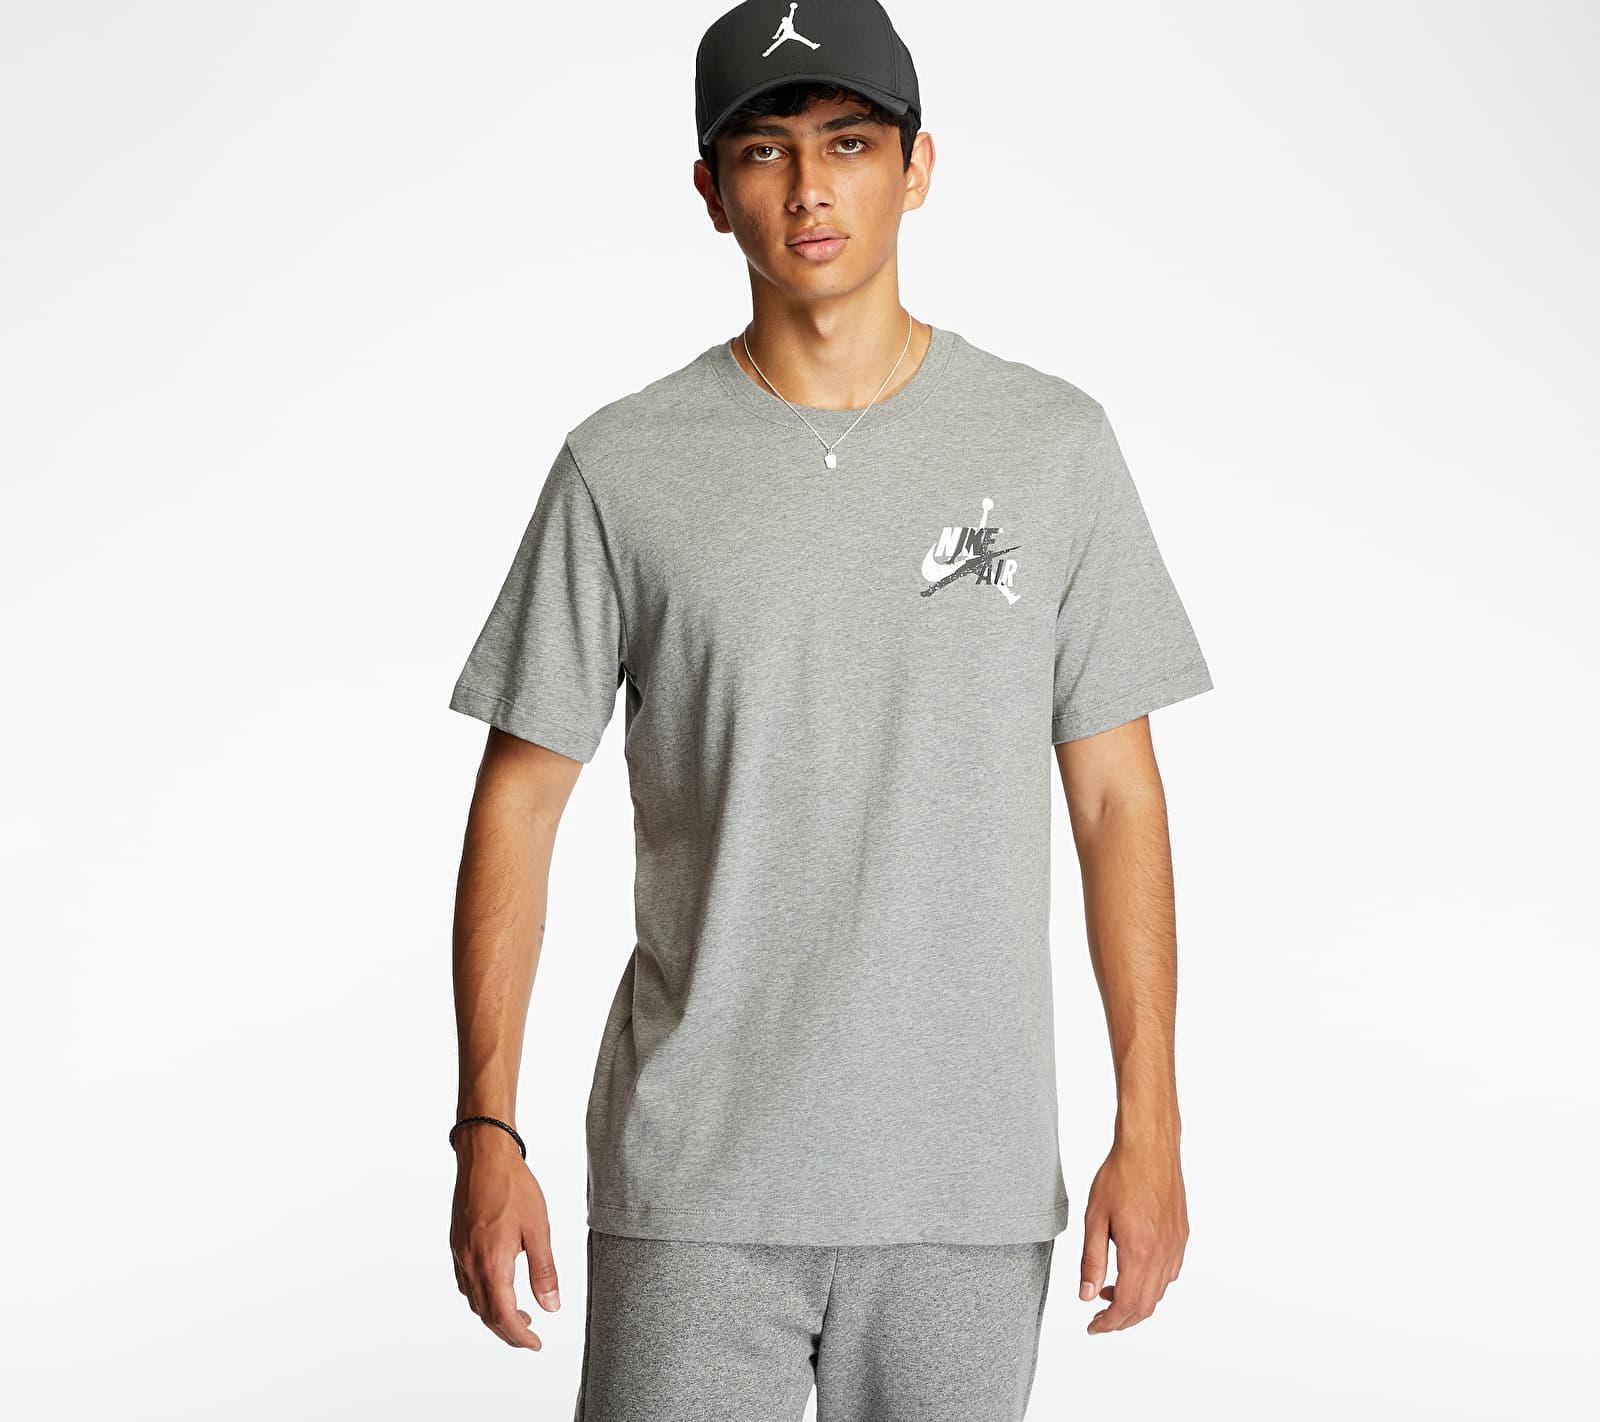 Jordan M J Jumpman Classics Graphic Tee Grey, Gray